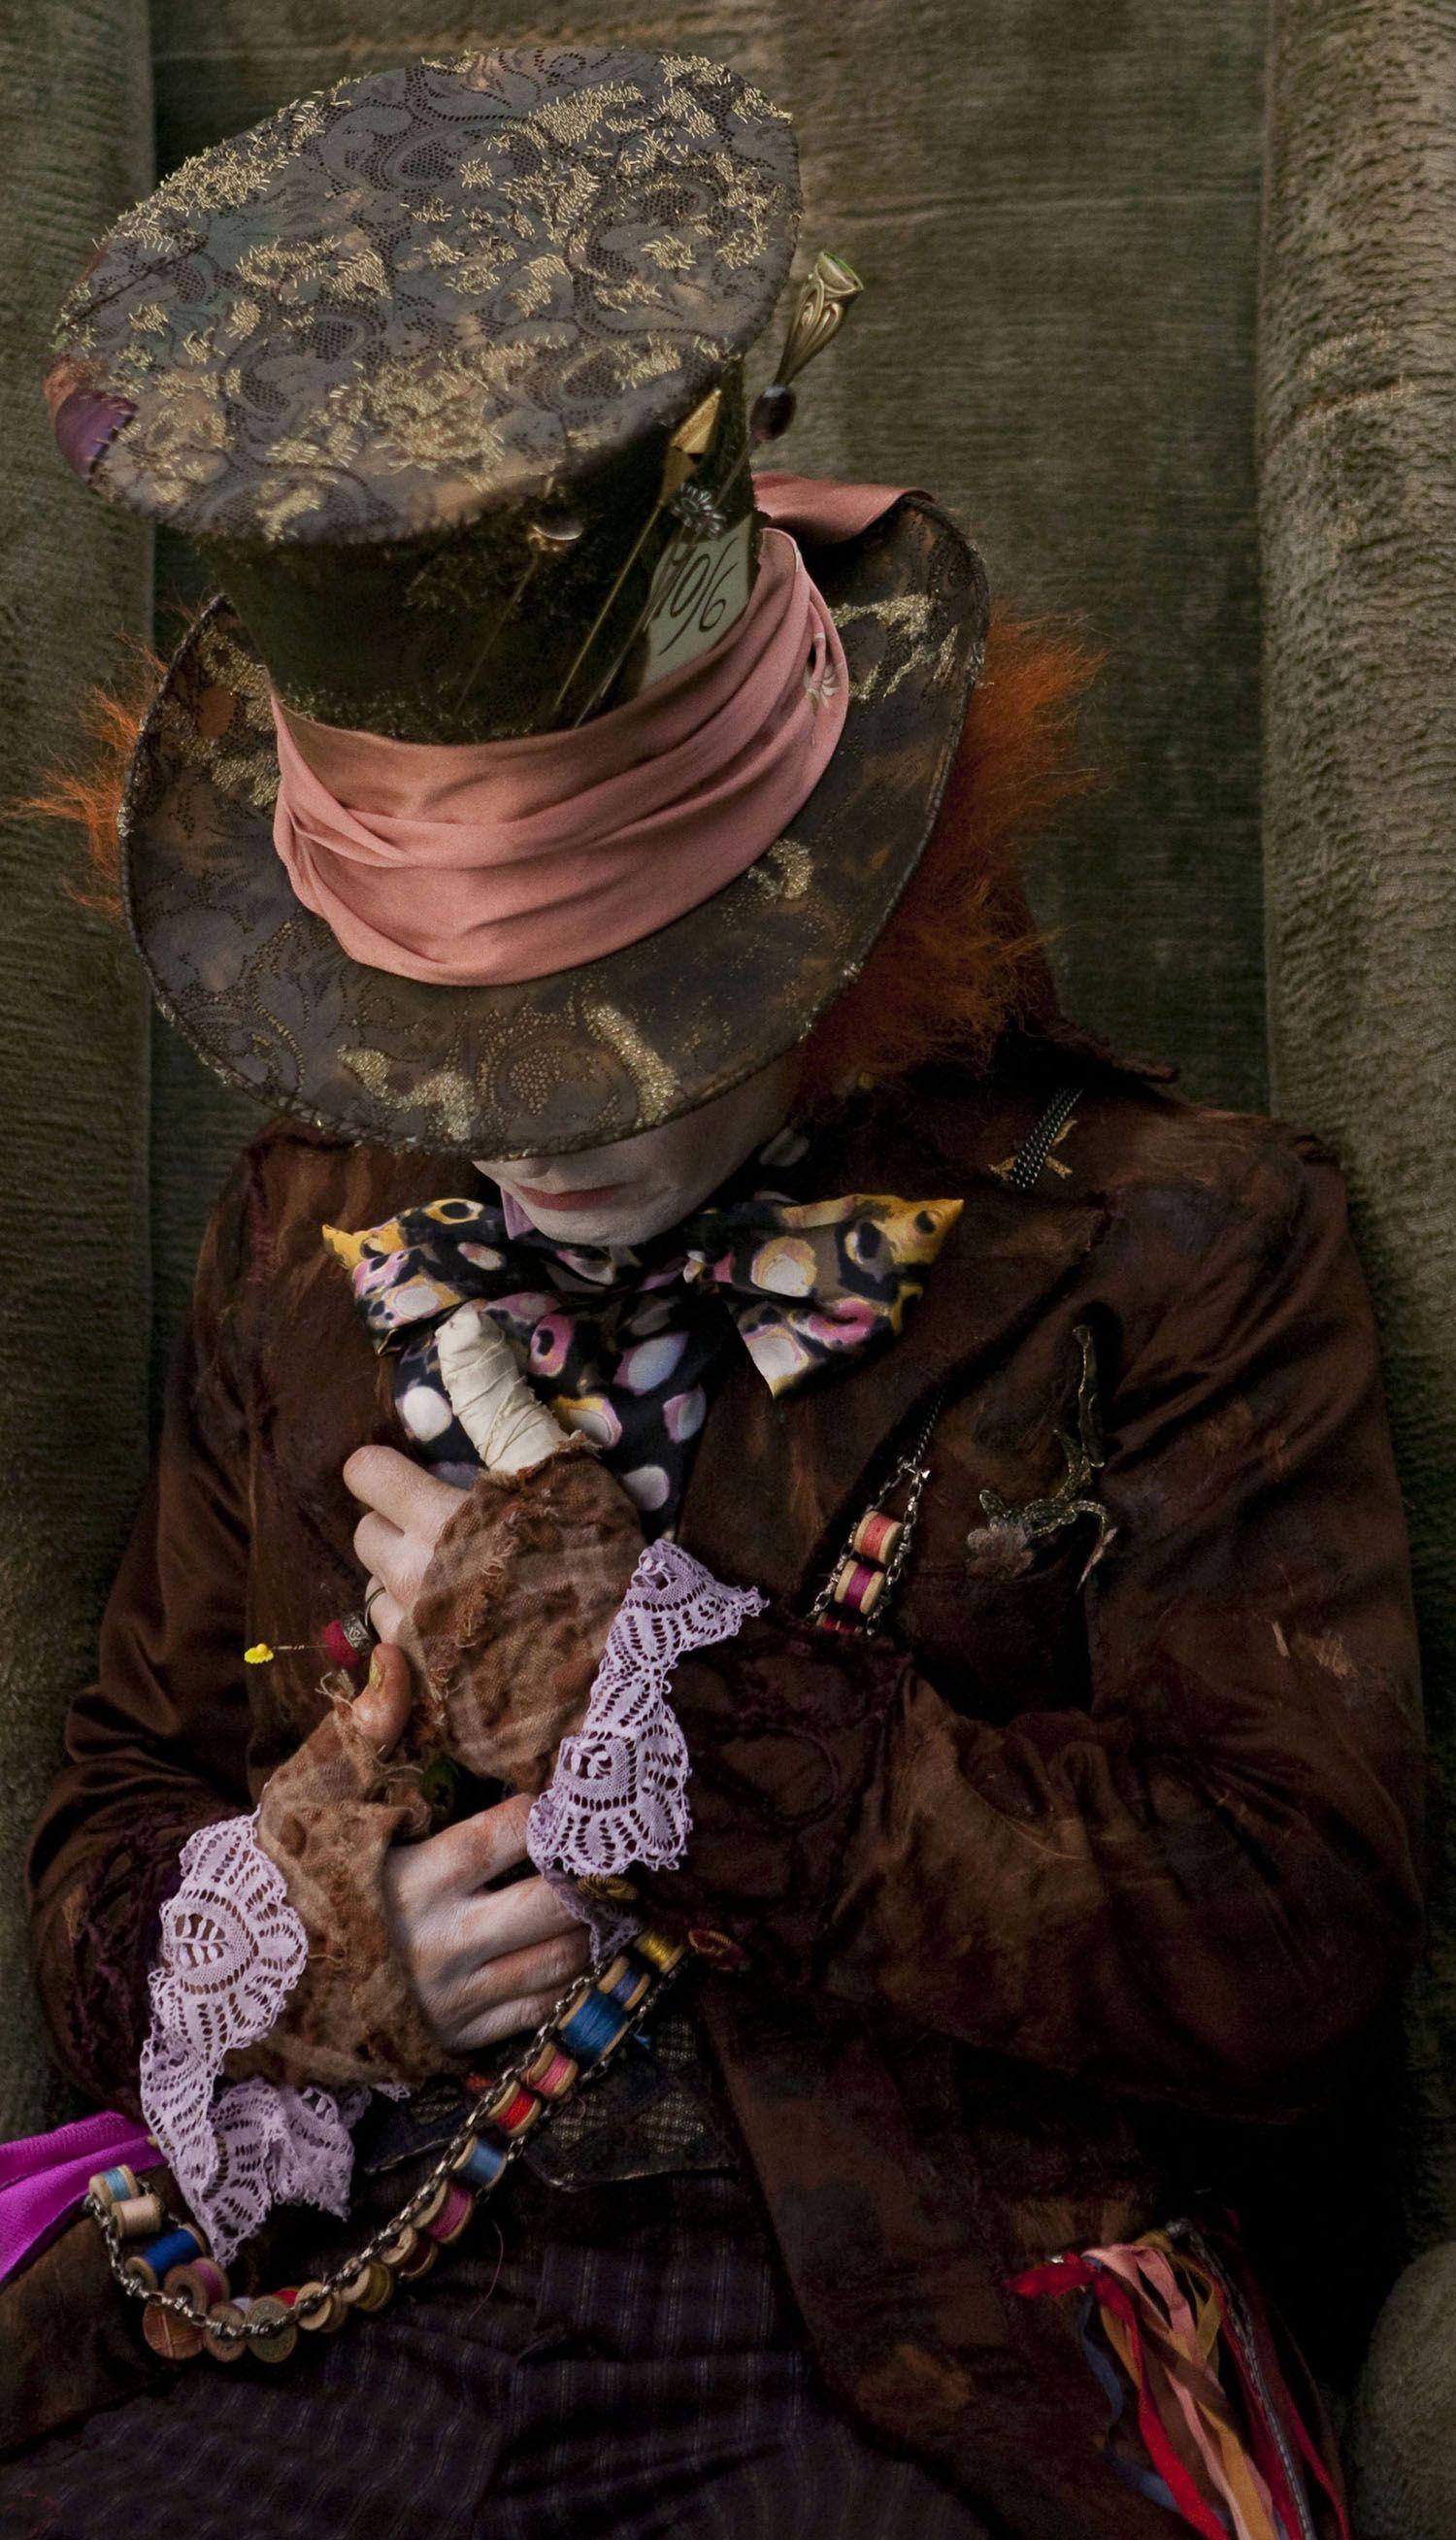 Alice In Wonderland Alice In Wonderland Johnny Depp Episode39 Cappellaio Matto Sfondo Con Motivo Disney Dipinti Disney